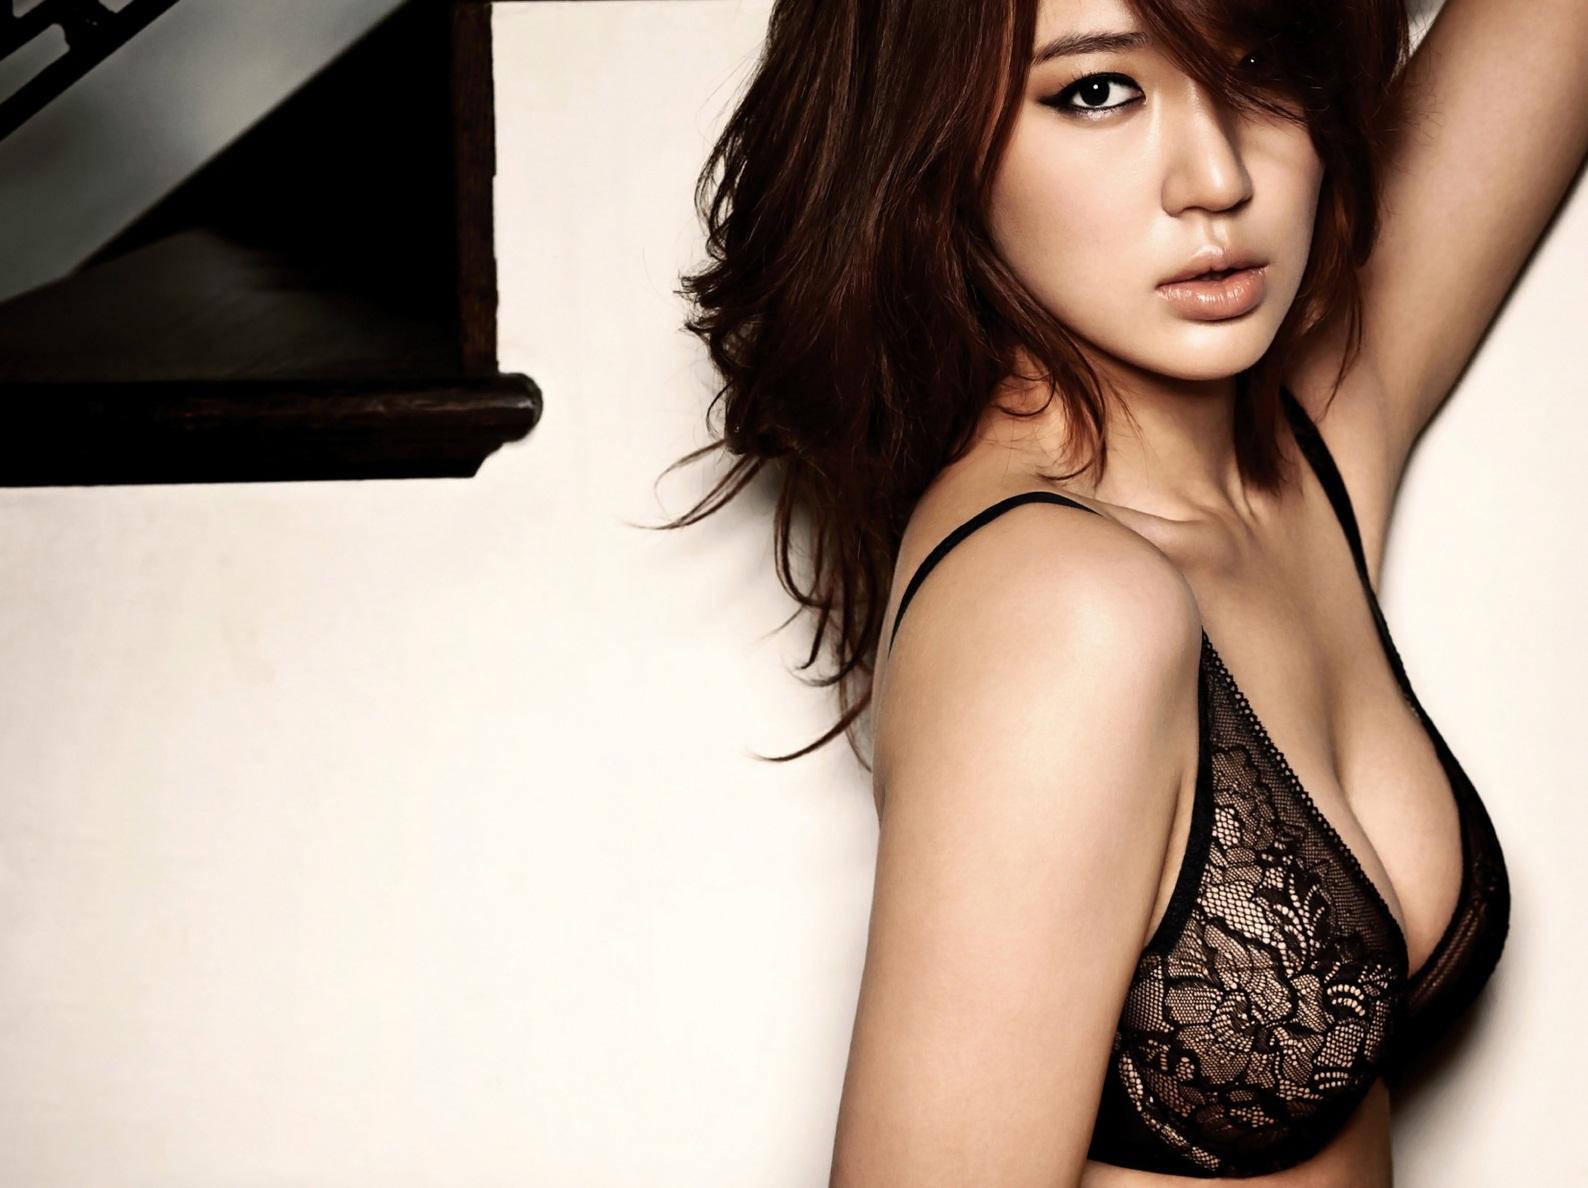 yoon eun hye dazed confused pictures 5 yoon eun hyeYoon Eun Hye